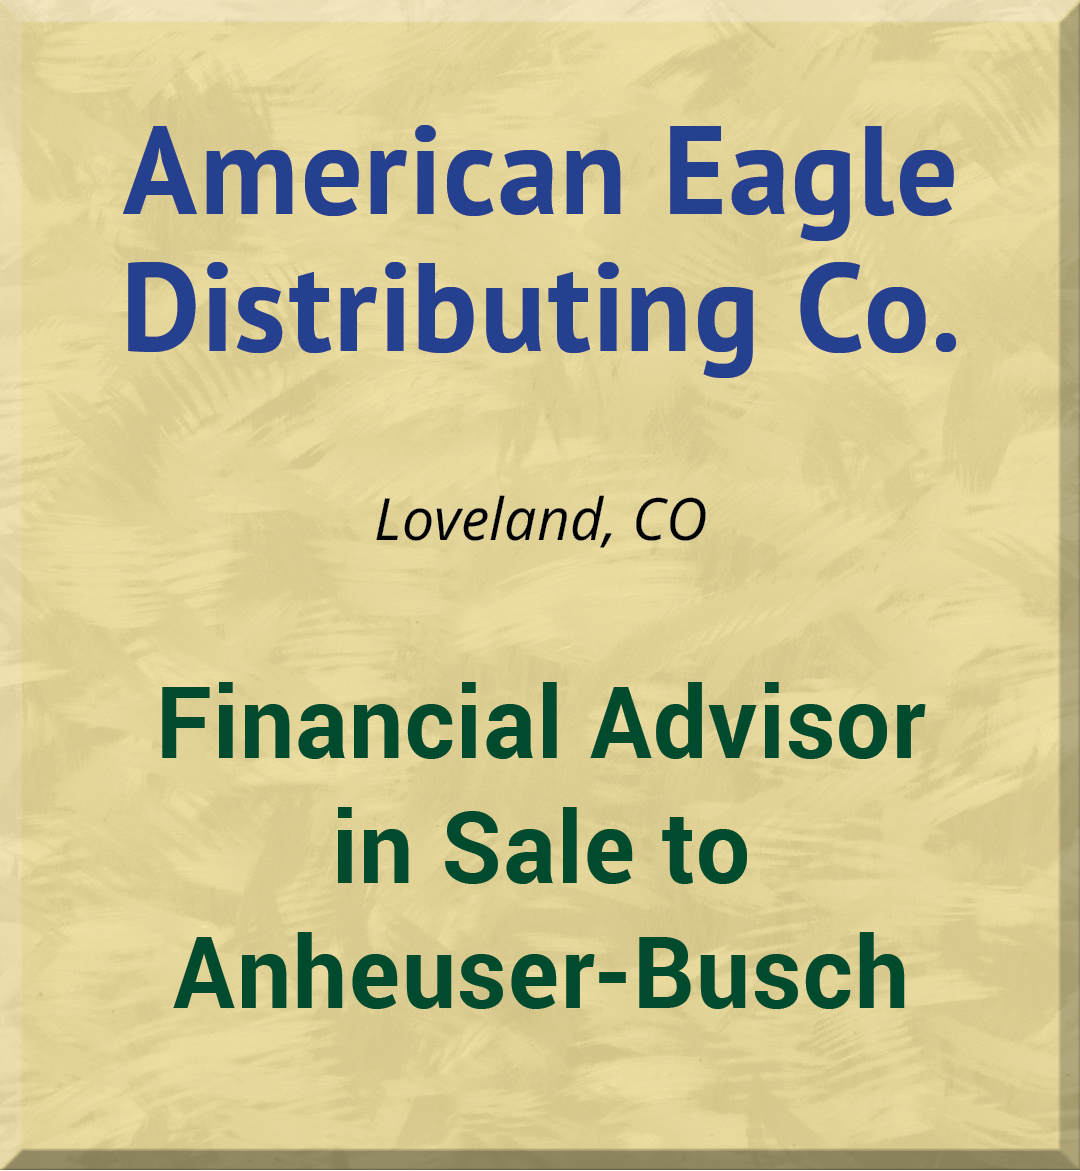 American Eagle Distributing Co.